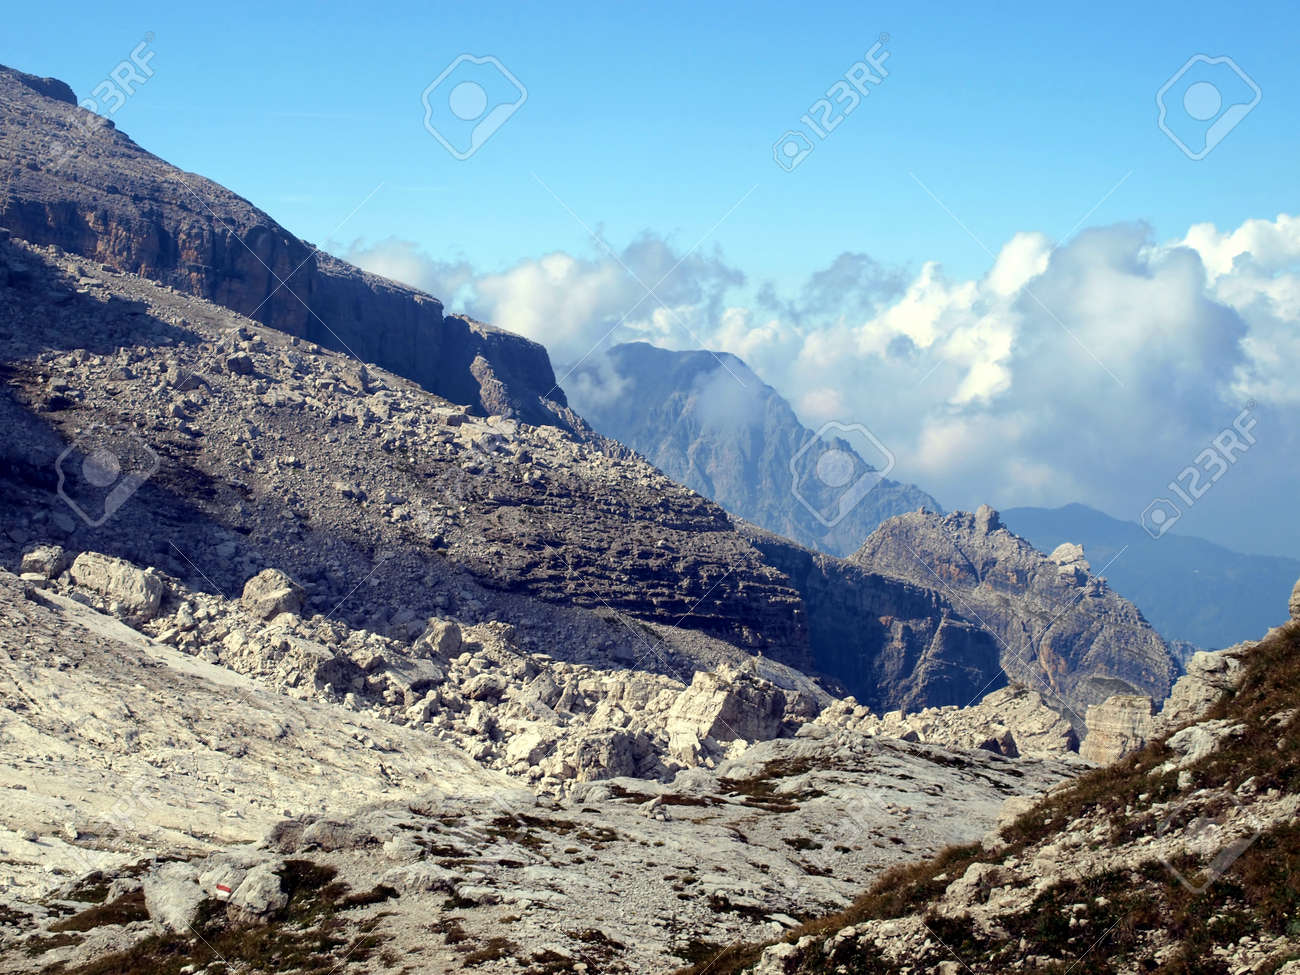 Brenta Dolomites mountain views in the area of   Alfredo Sentiero path and pass Groste, Italy Stock Photo - 22974910